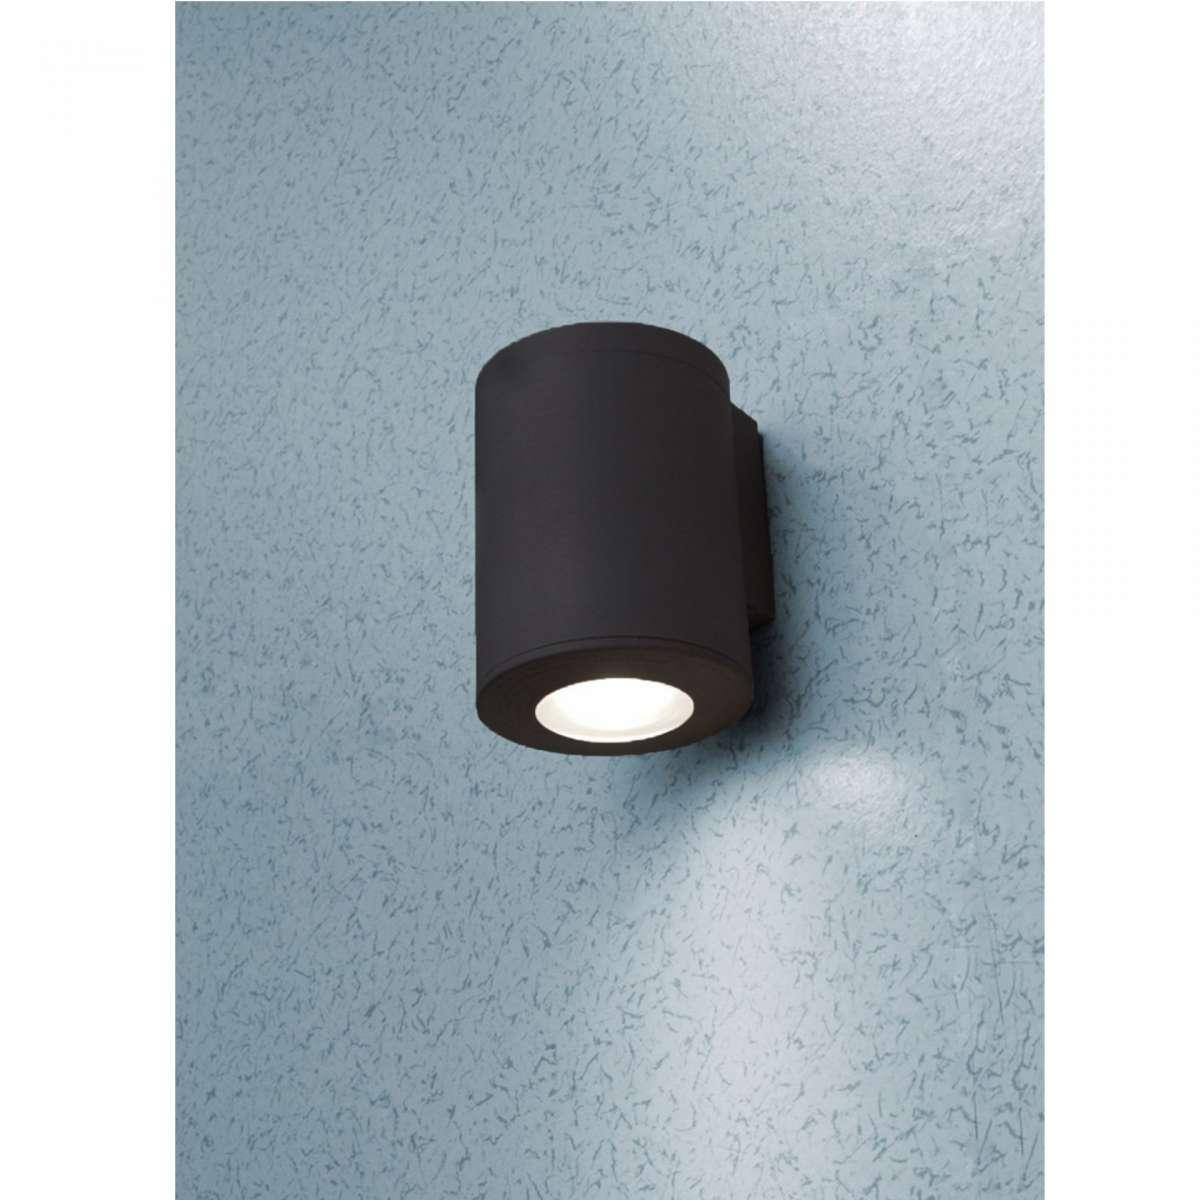 Franca 90 Black LED 3.5W Up/Down Wall Light